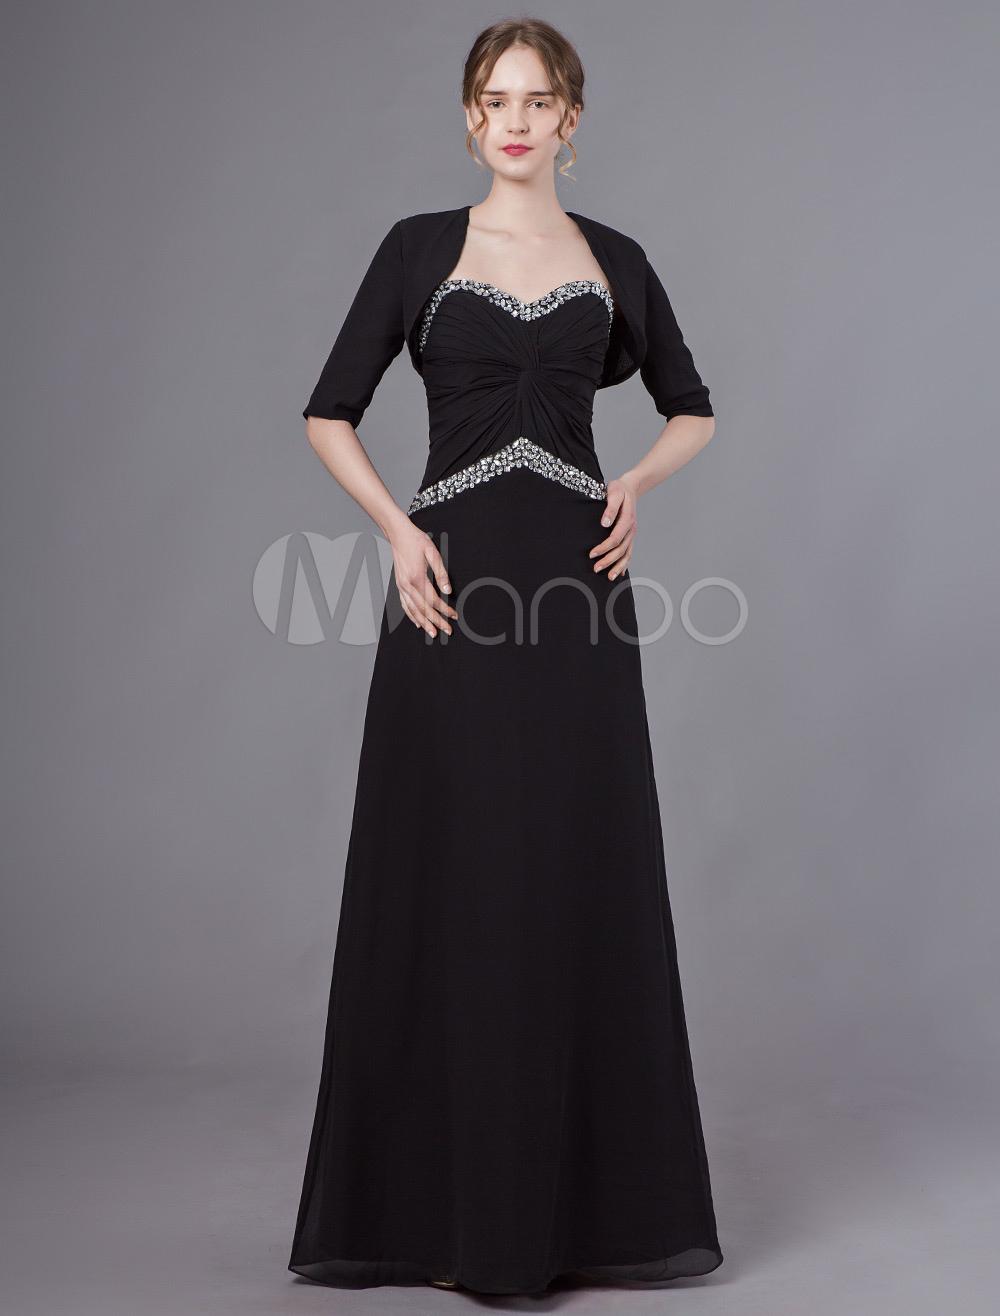 590bdd105b0 Mother Of The Bride Dresses Bolero Jacket Outfit Sweetheart Black Beaded  Chiffon Wedding Party Dress- ...